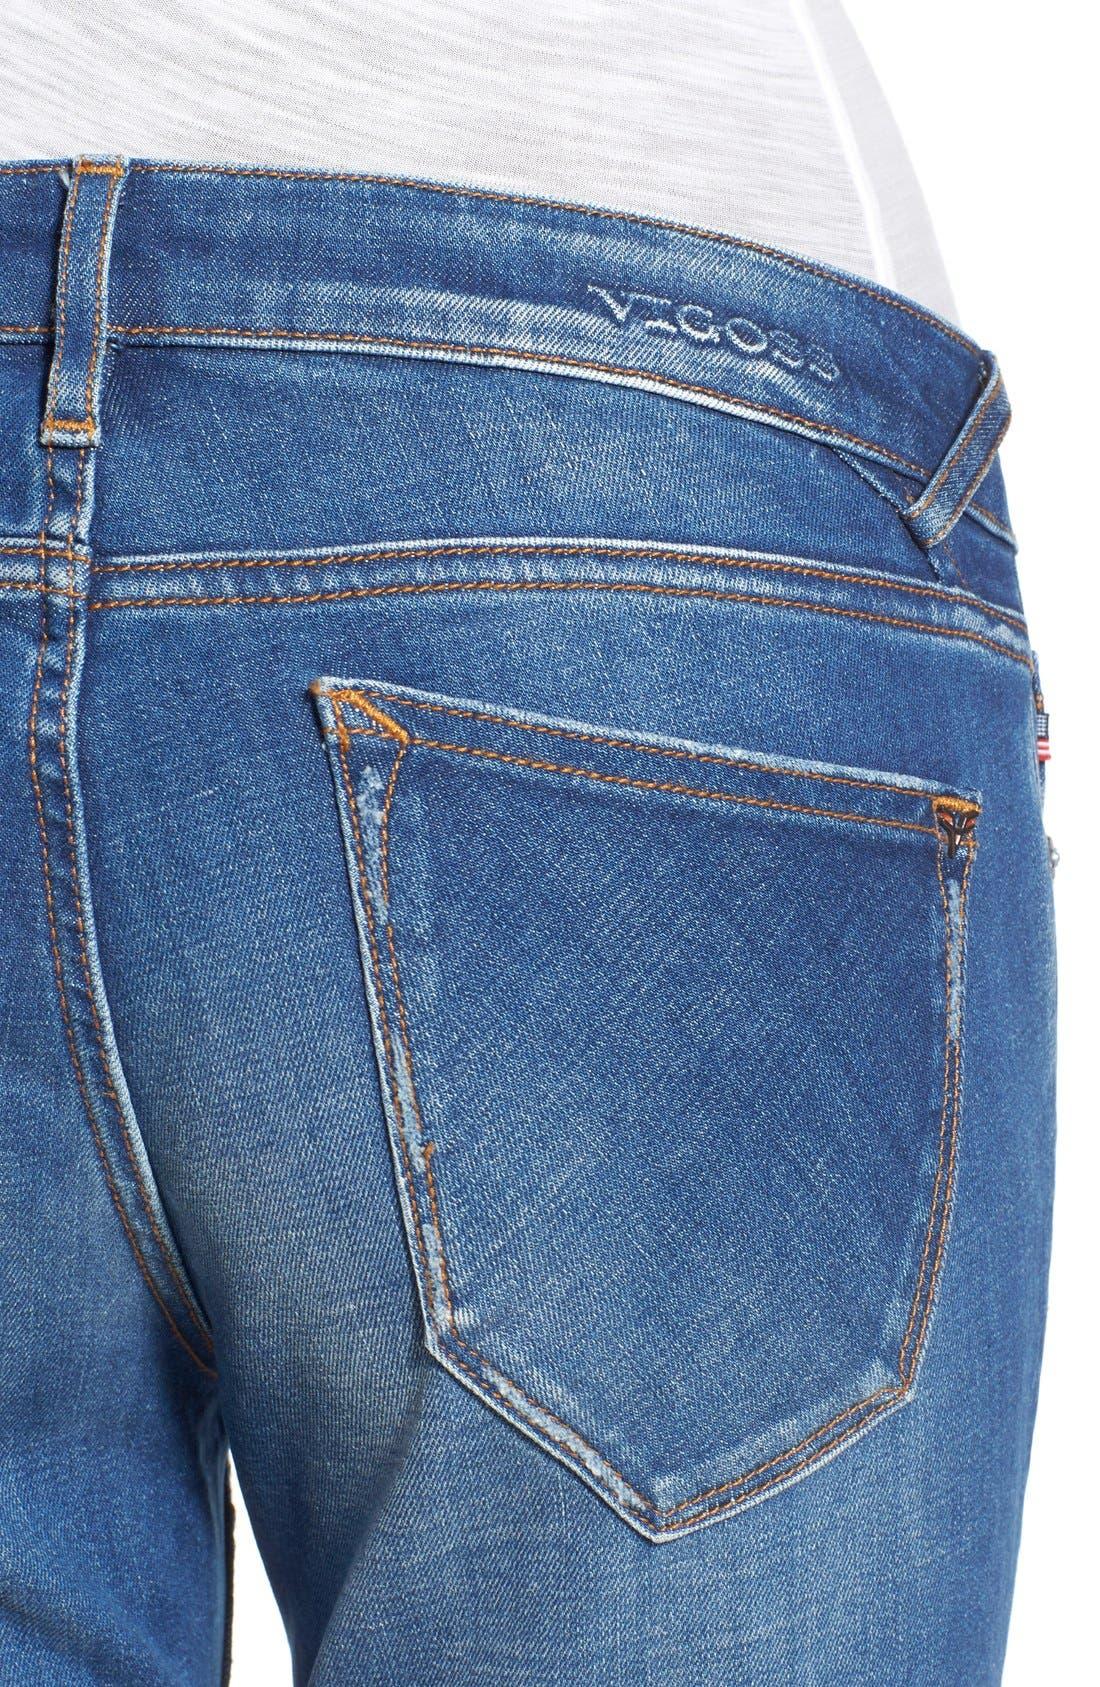 Alternate Image 4  - Vigoss 'Tomboy Thompson' Destructed Jeans (Medium Wash)